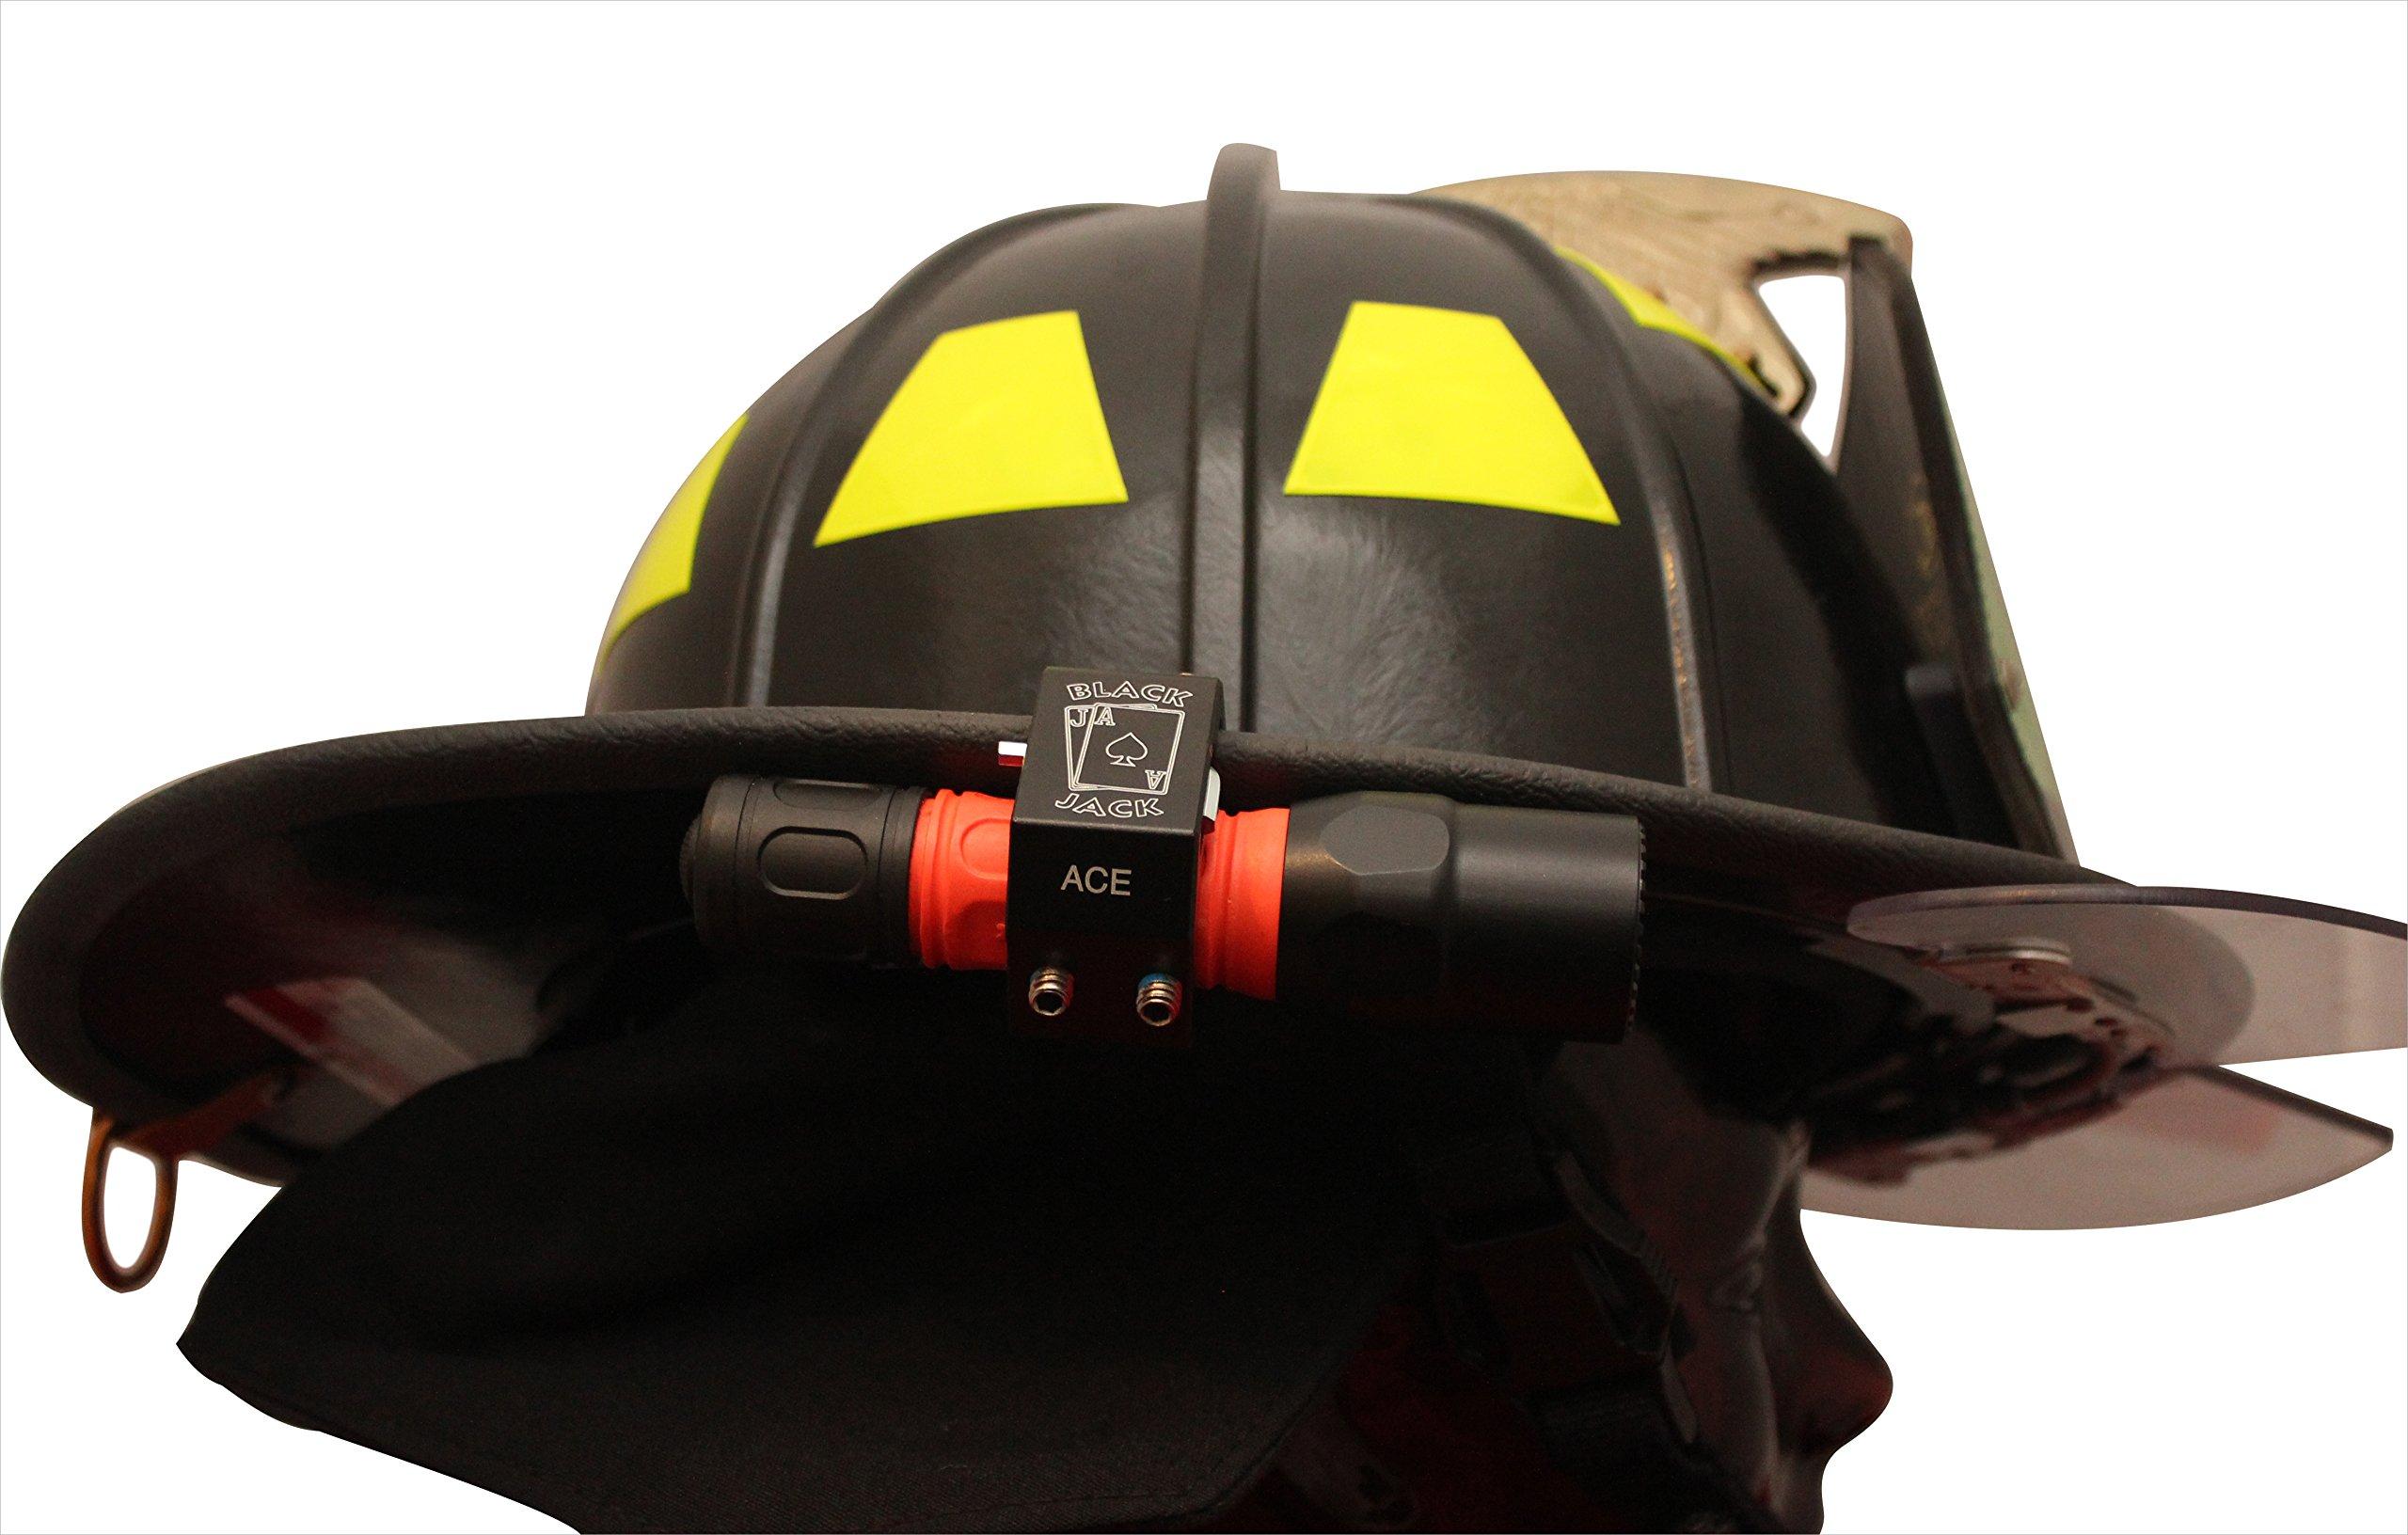 Blackjack ACE Firefighter Helmet Aluminum Flashlight Holder by Blackjack Fire & Safety (Image #3)